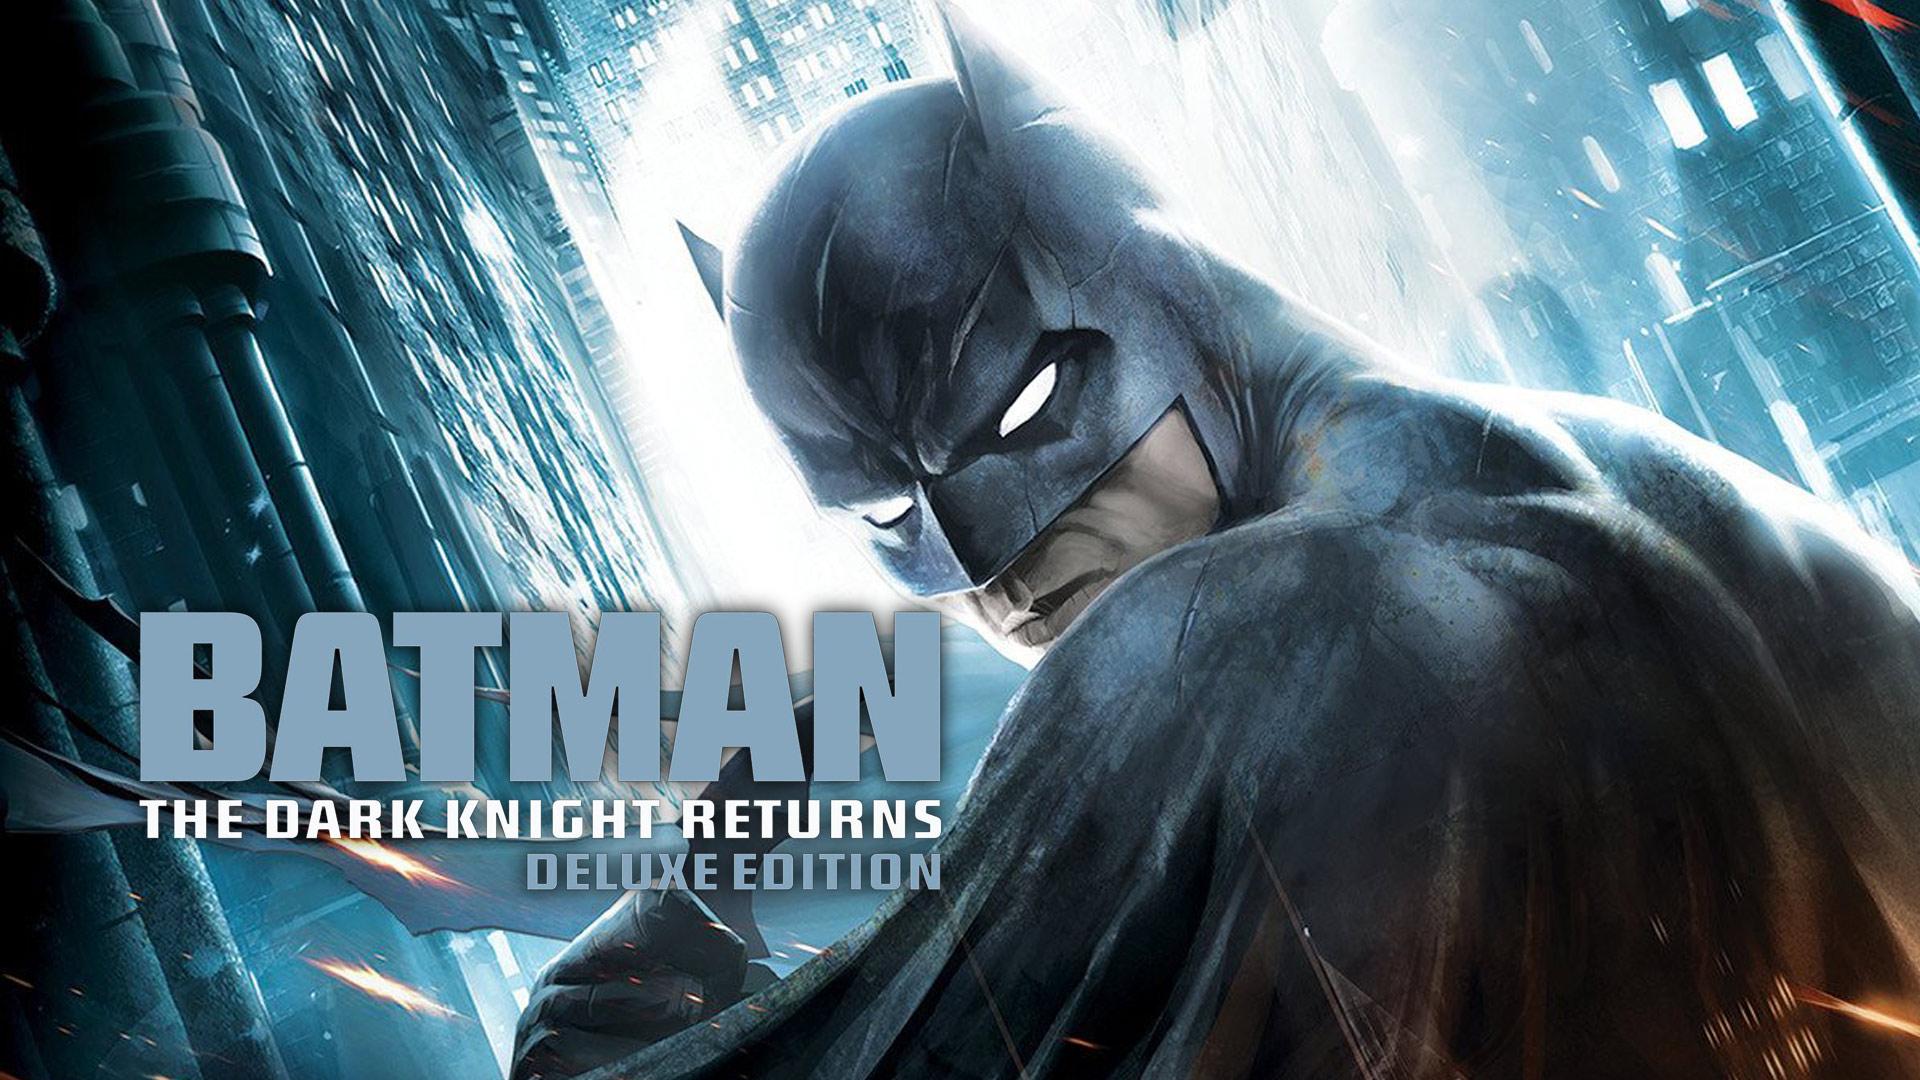 Batman: The Dark Knight Returns Deluxe Edition